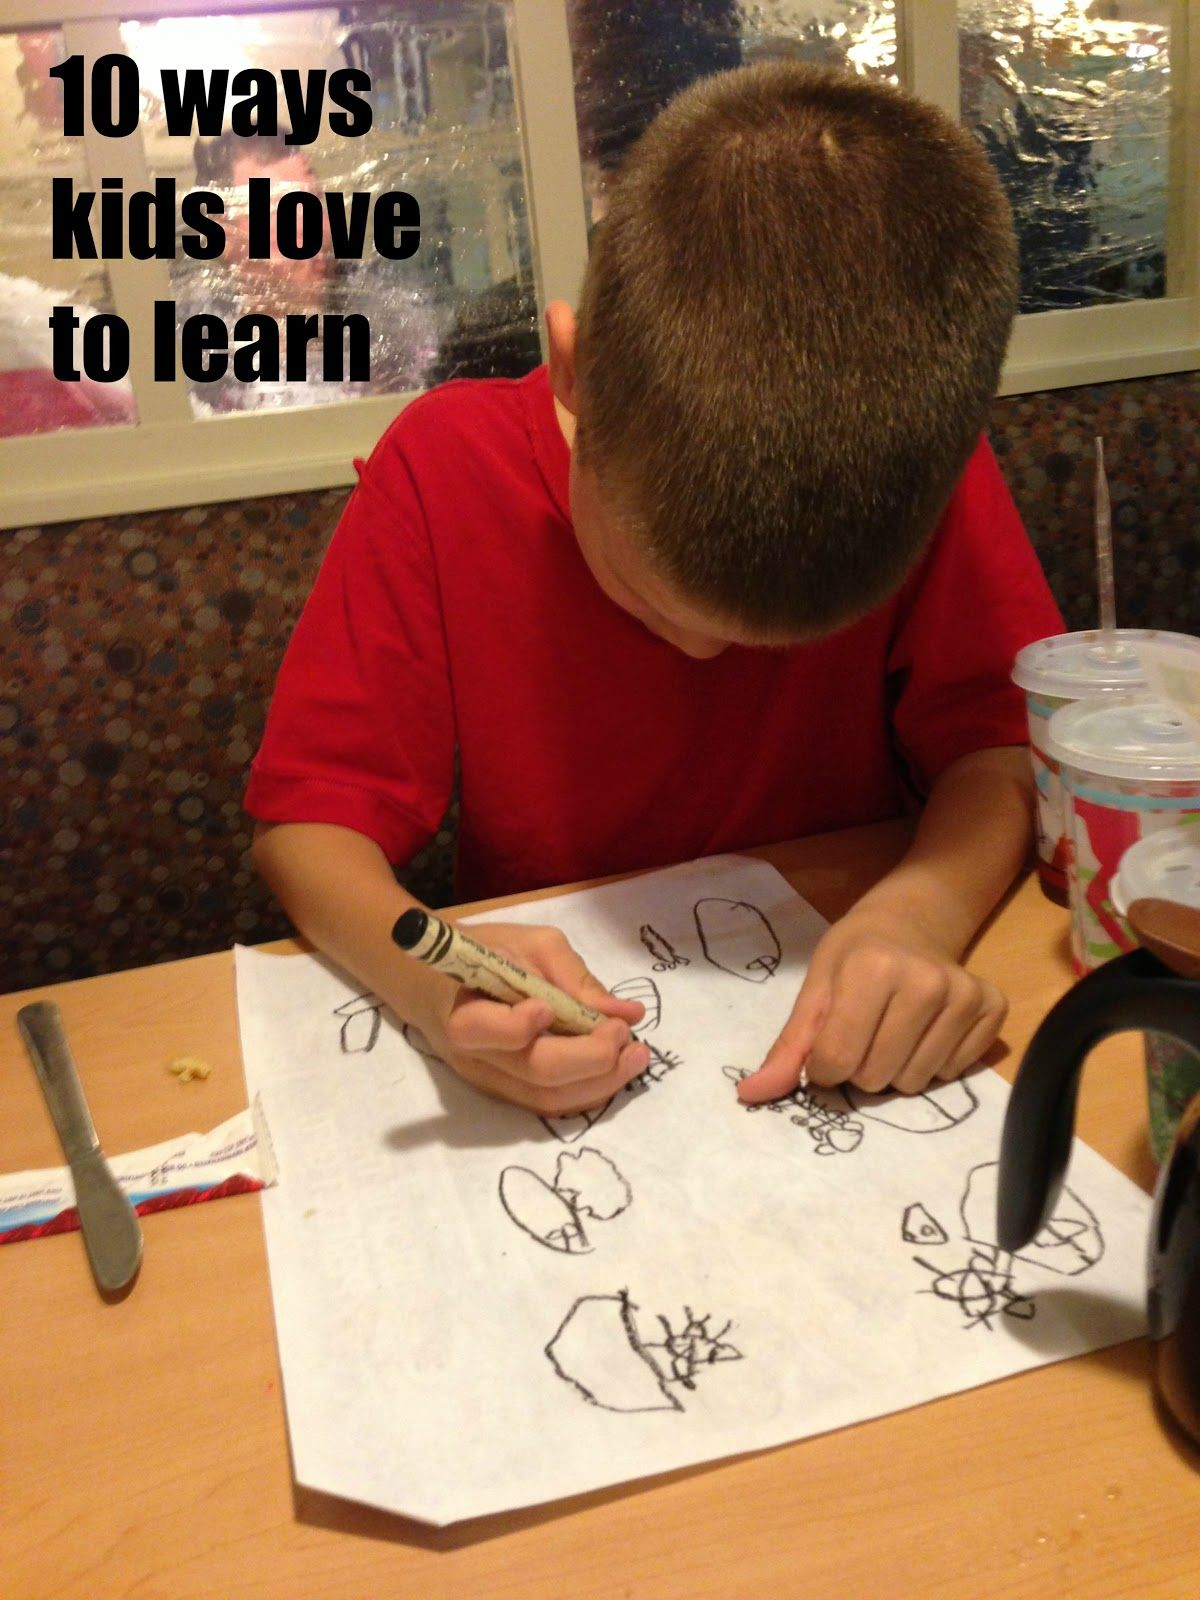 10 Ways My Kids Love To Learn